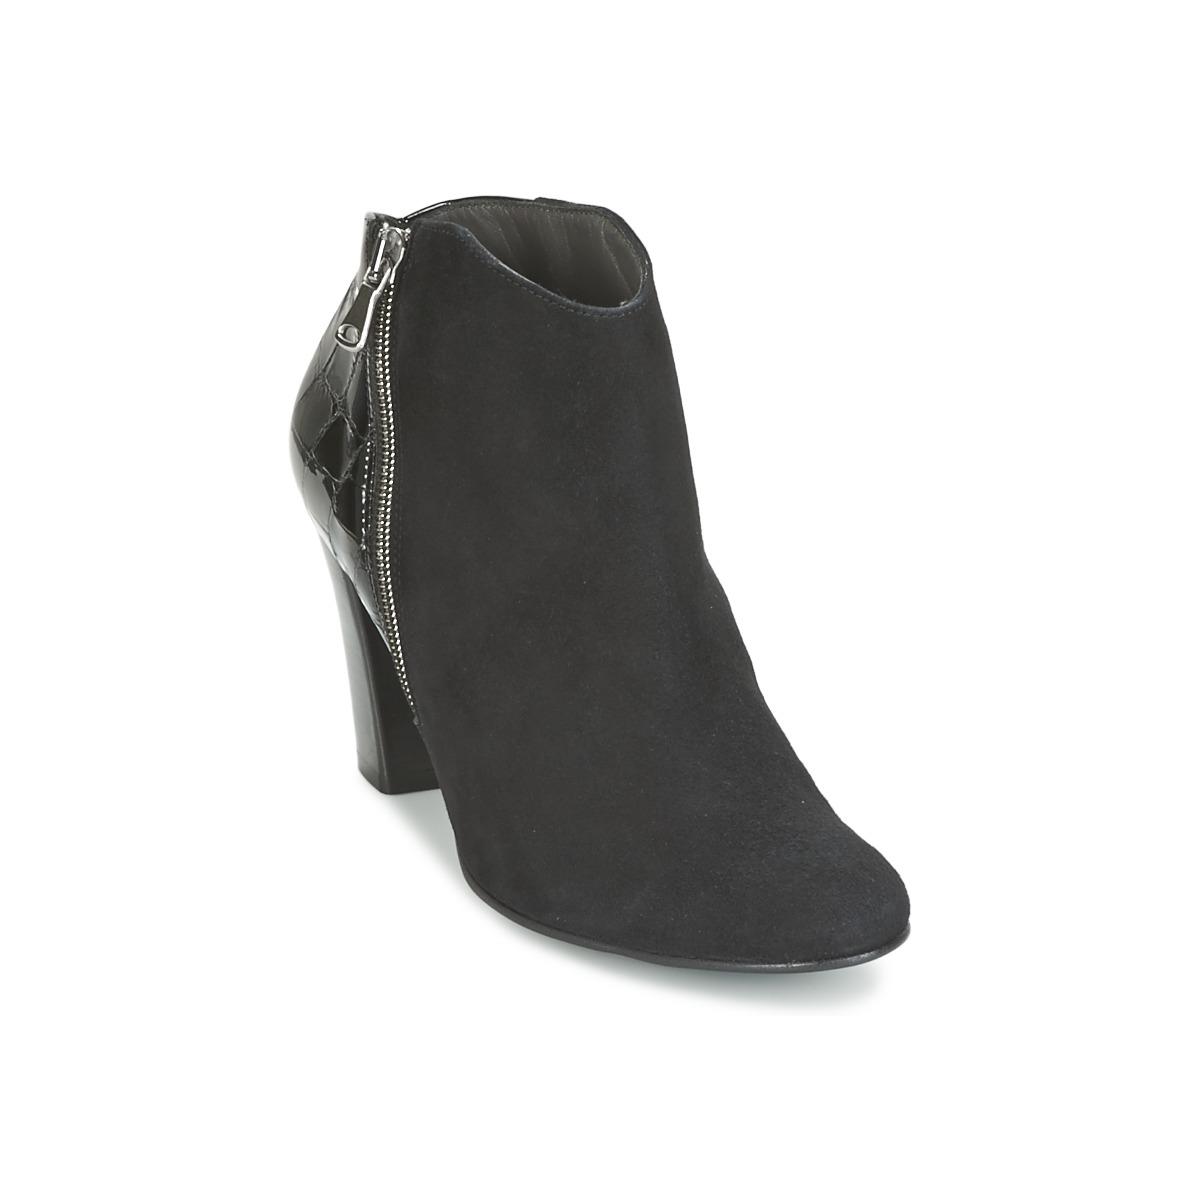 France Mode NANTES Schwarz - Kostenloser Versand bei Spartoode ! - Schuhe Ankle Boots Damen 79,50 €